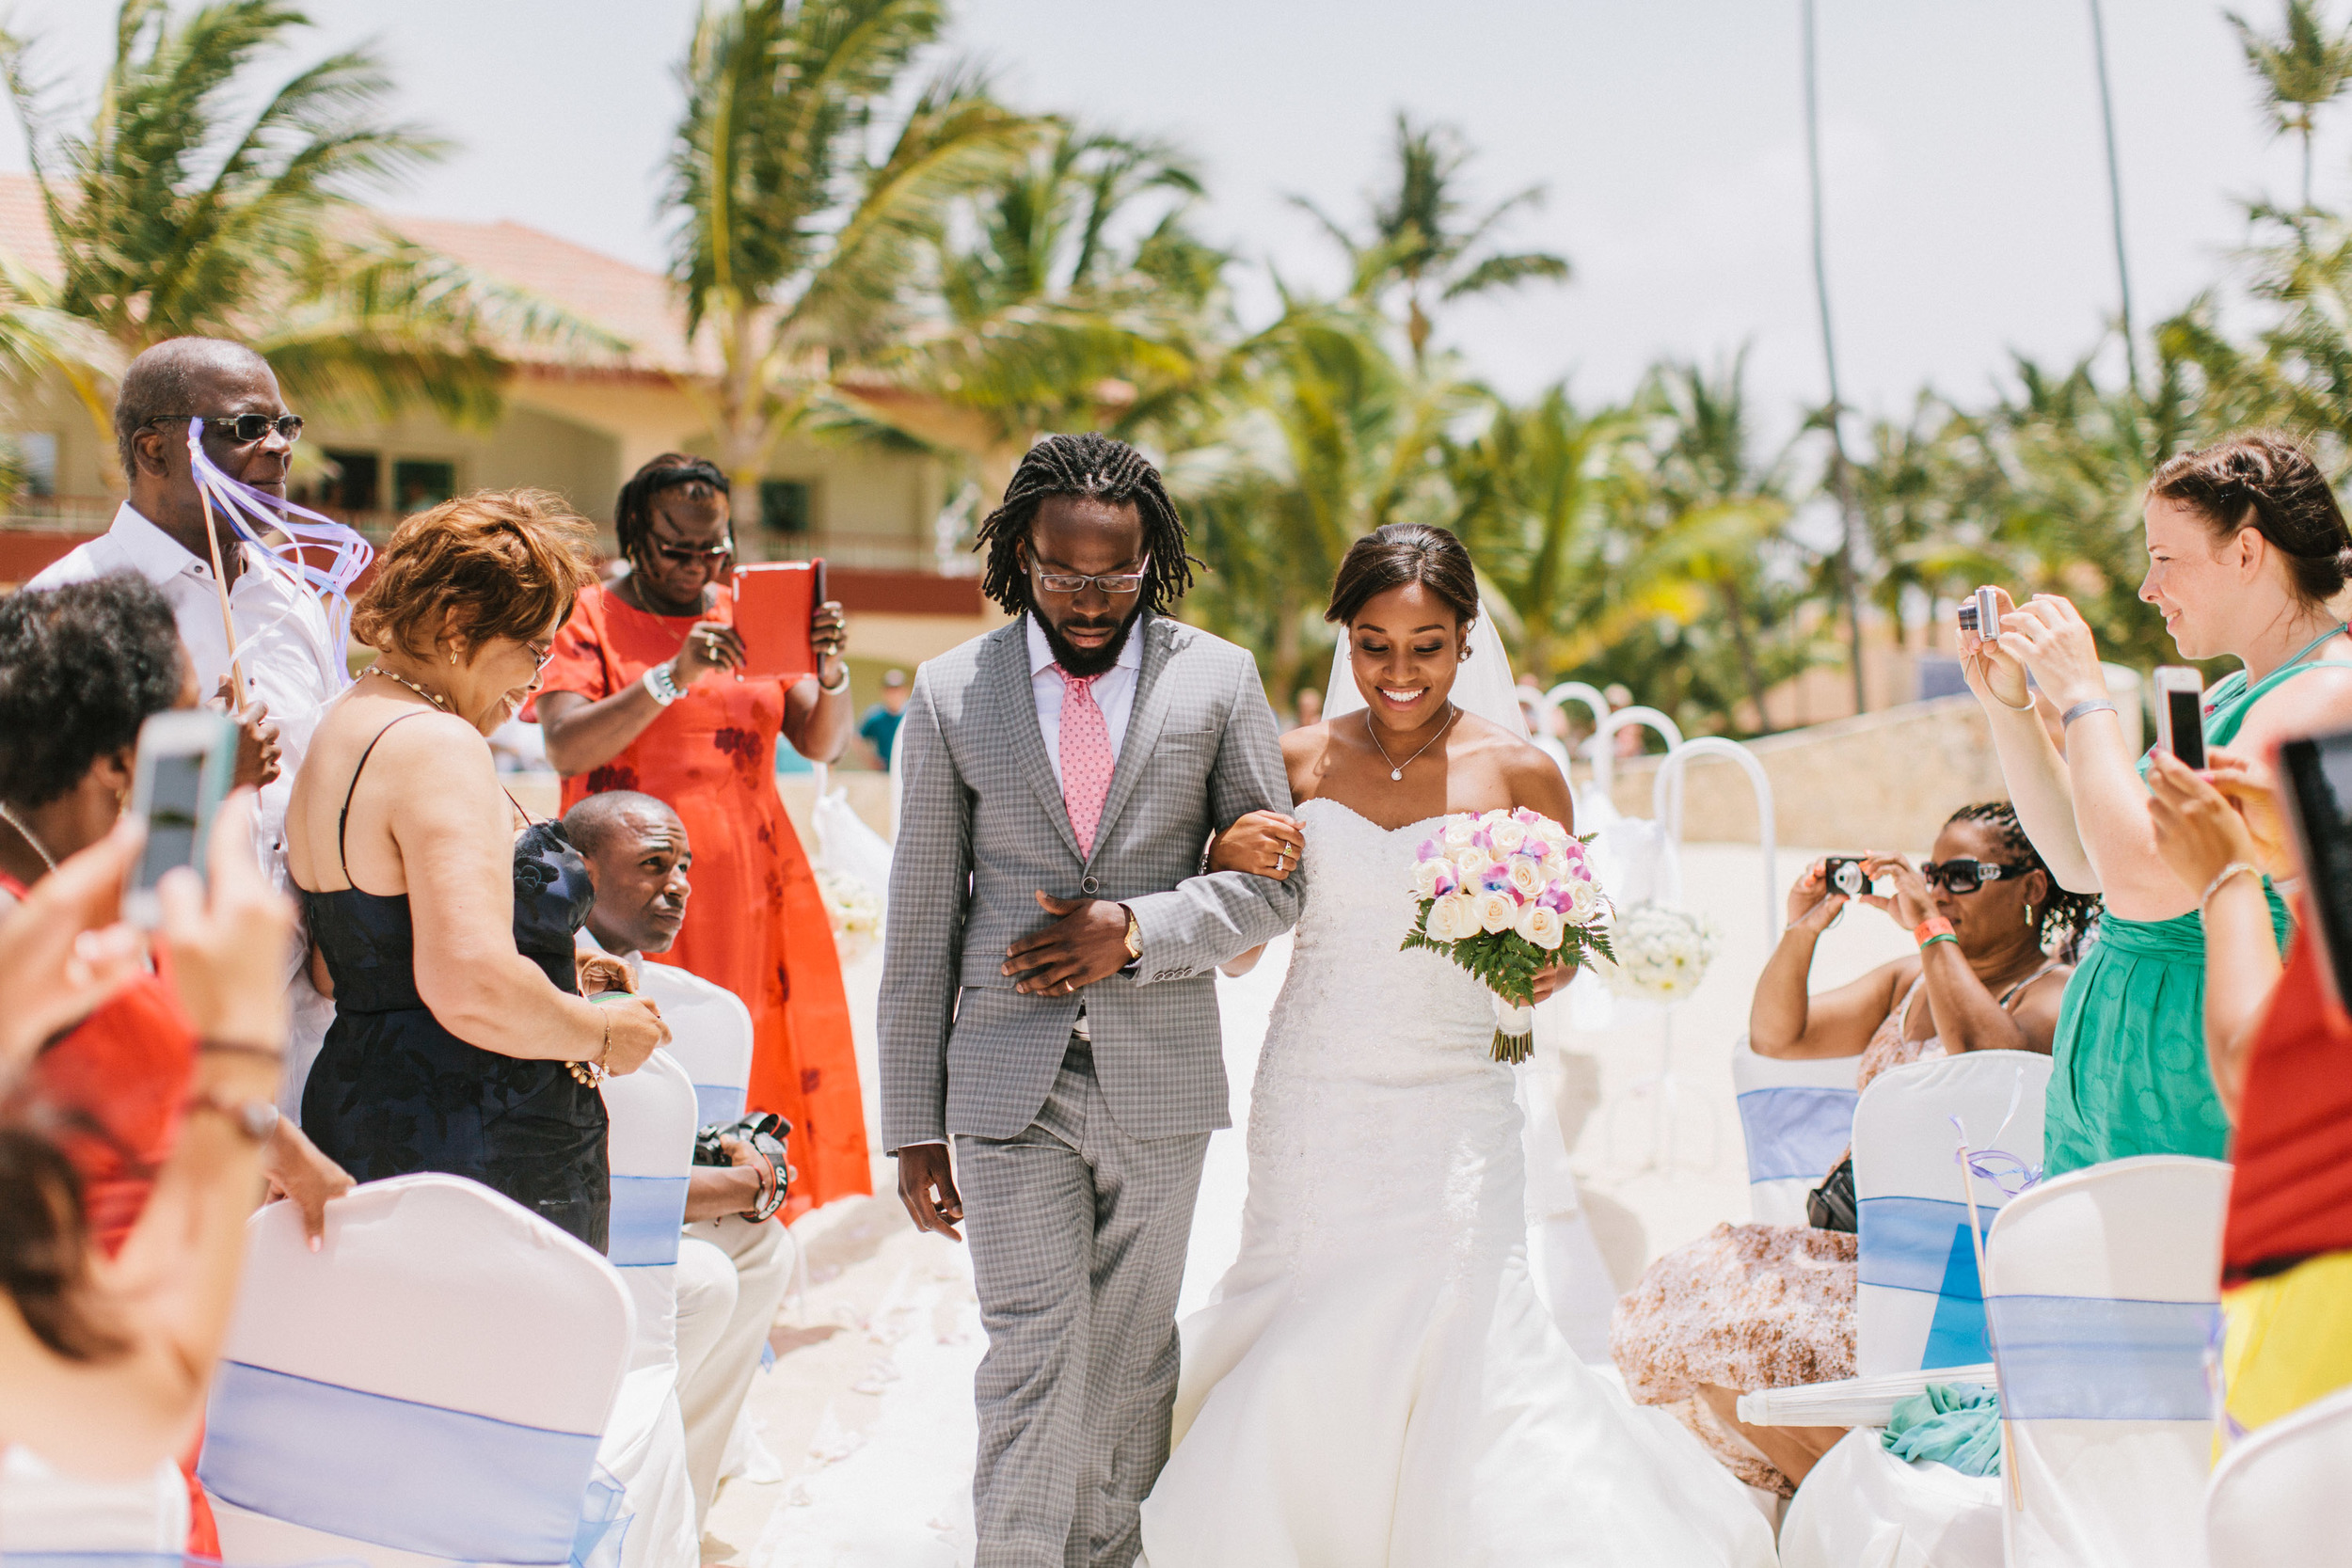 michael-rousseau-photography-dominican-republic-destination-wedding-cara-jason-colonial-majestic-dominican-republic068.jpg